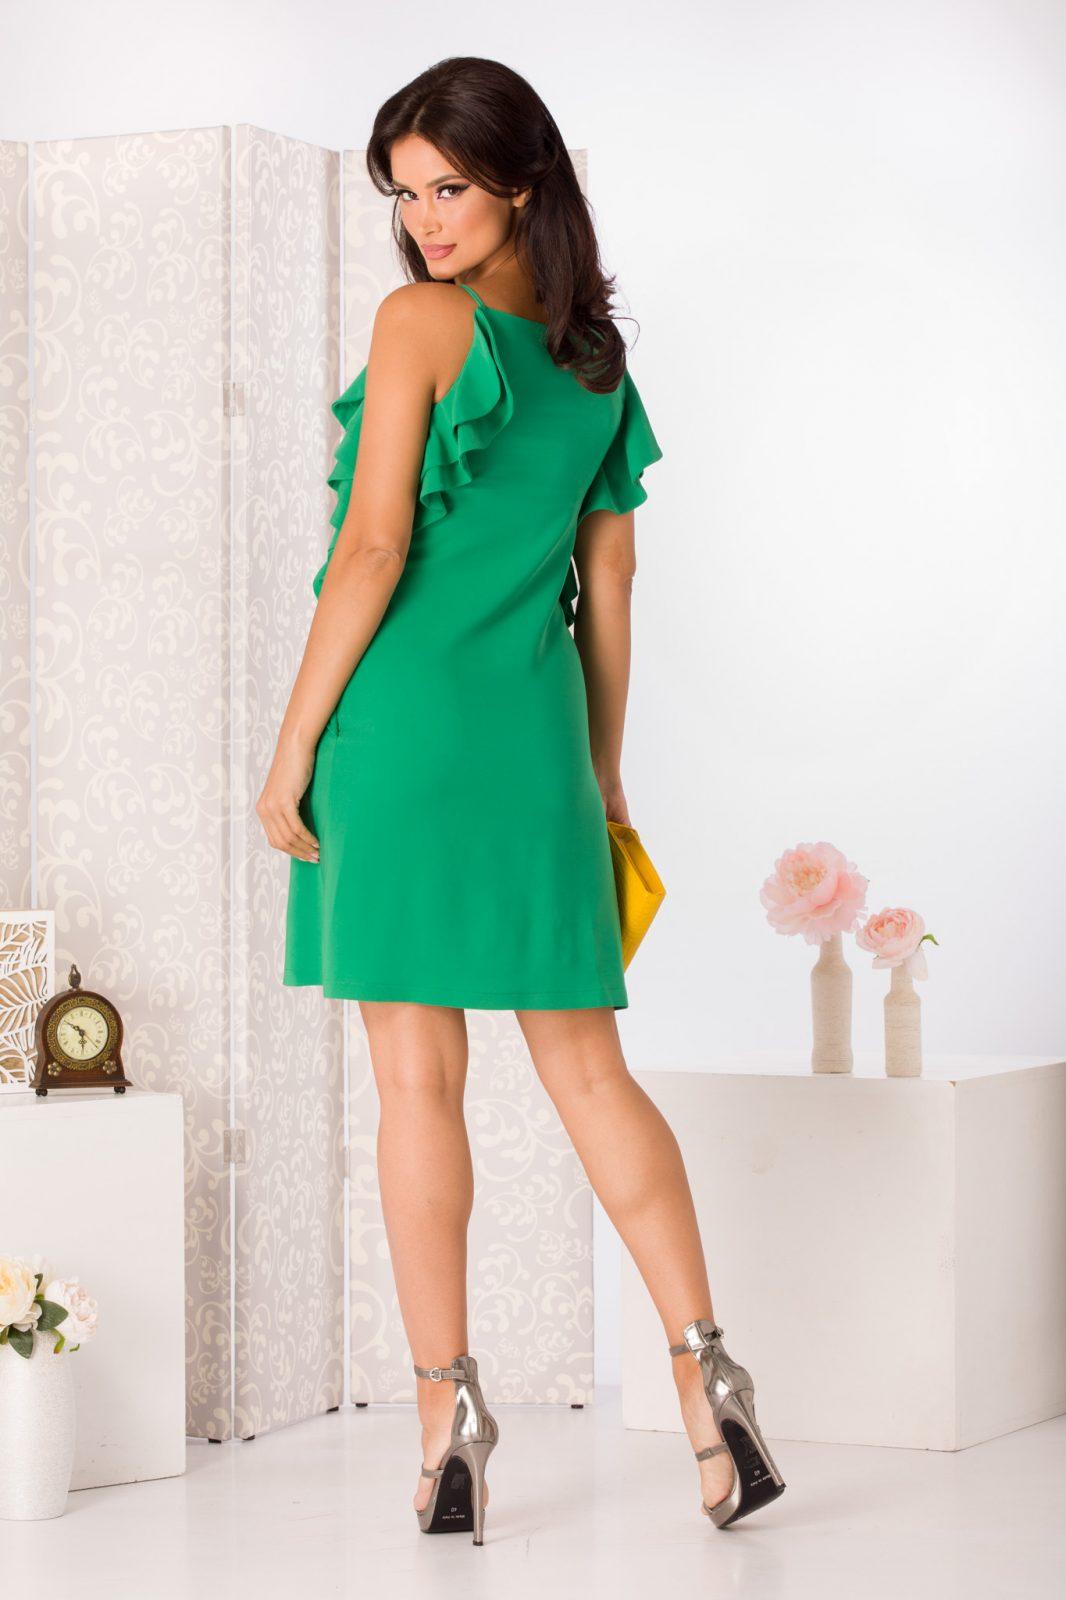 La Donna Lorna Πράσινο Φόρεμα 4976